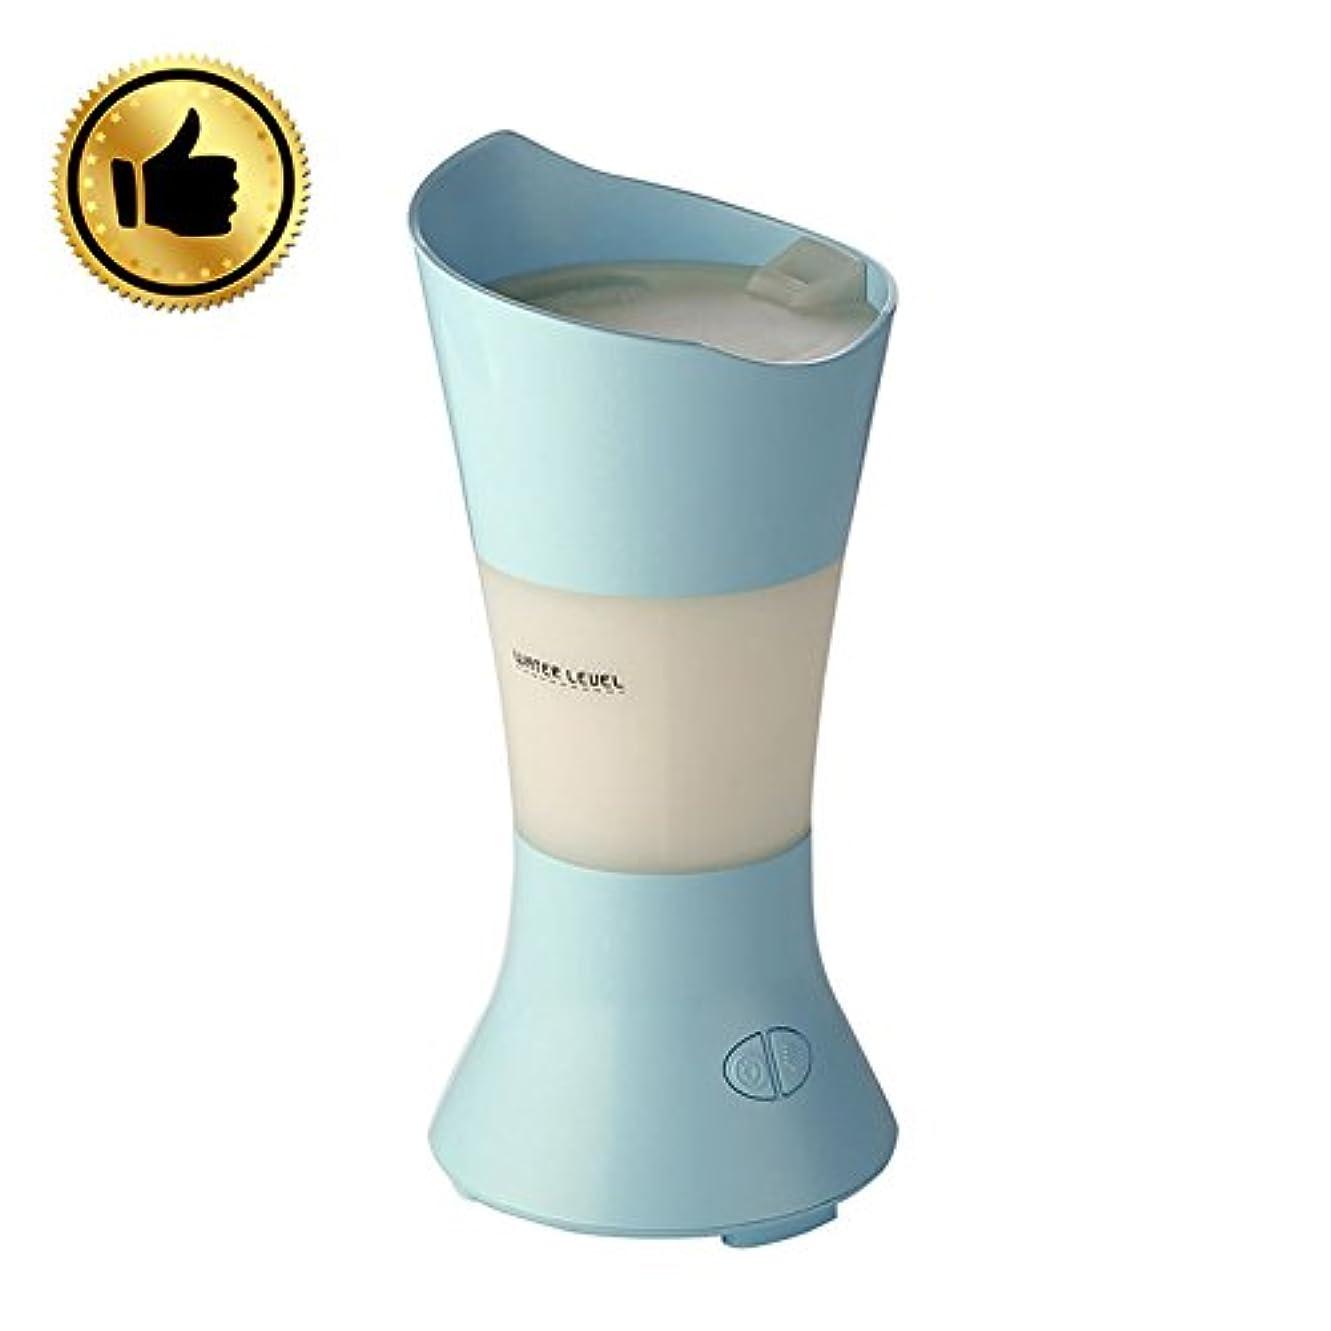 J&H 花の妖精 超音波式アロマディフューザー 花瓶用 LEDナイトライト 超音波加湿器 エッセンシャルオイル アロマセラピー 家用 オフィス用(ブルー)